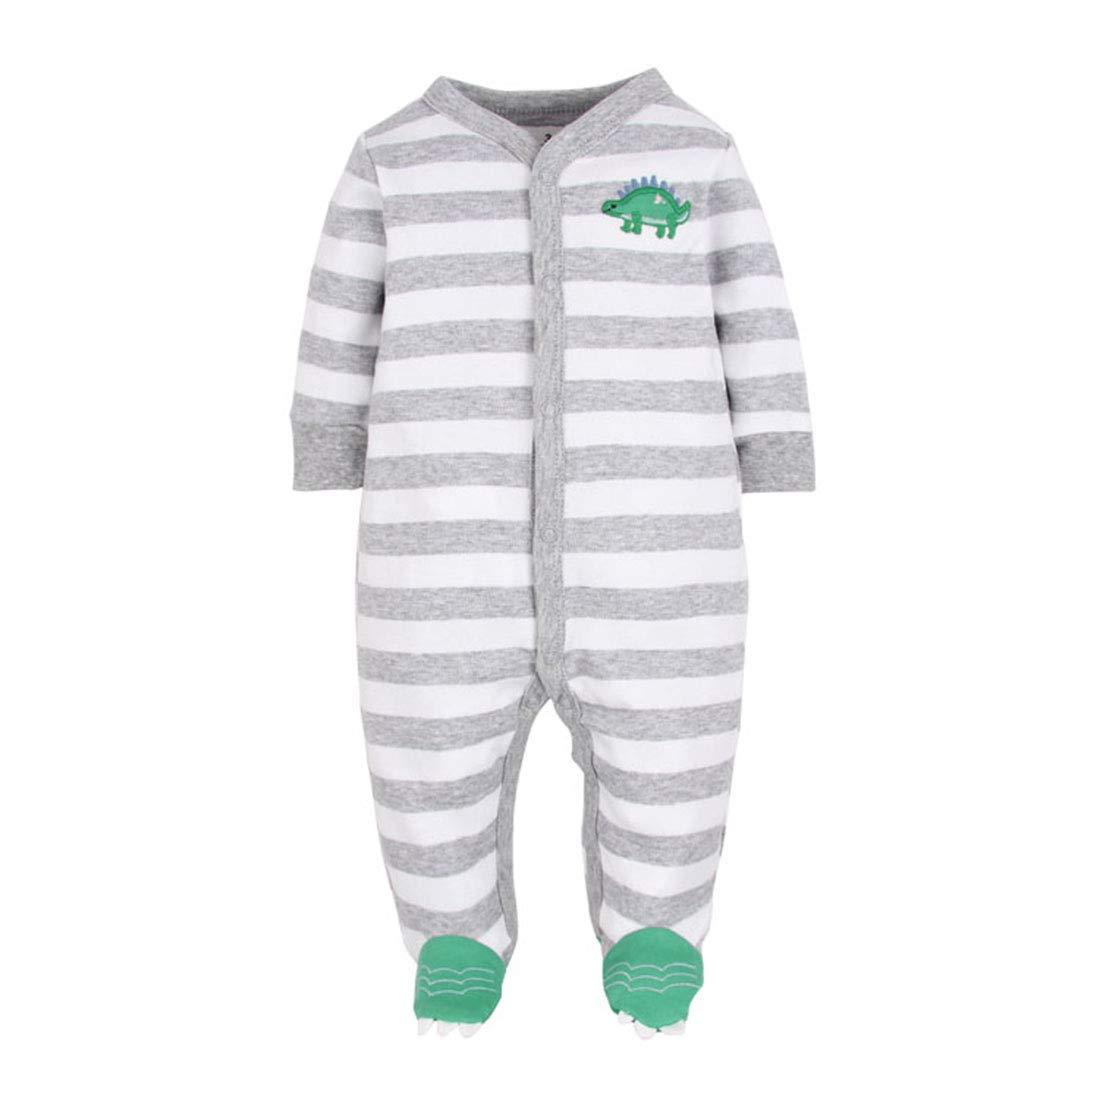 CARETOO Ourson b/éb/é somnolent somnolent b/éb/é Pyjama en Coton Bande dessin/ée Romper